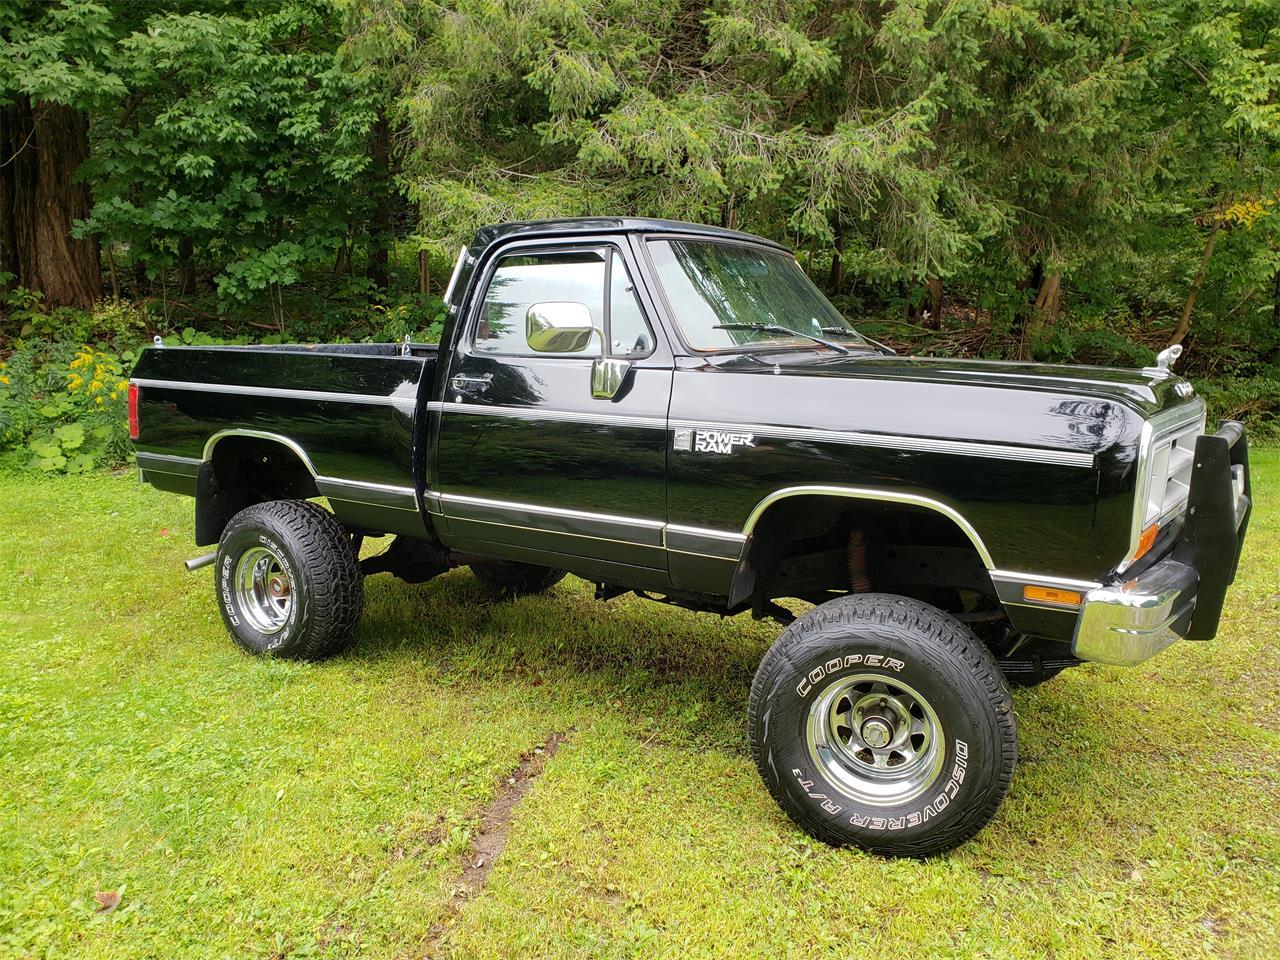 1988 Dodge Ram For Sale Classiccars Com Cc 1143073